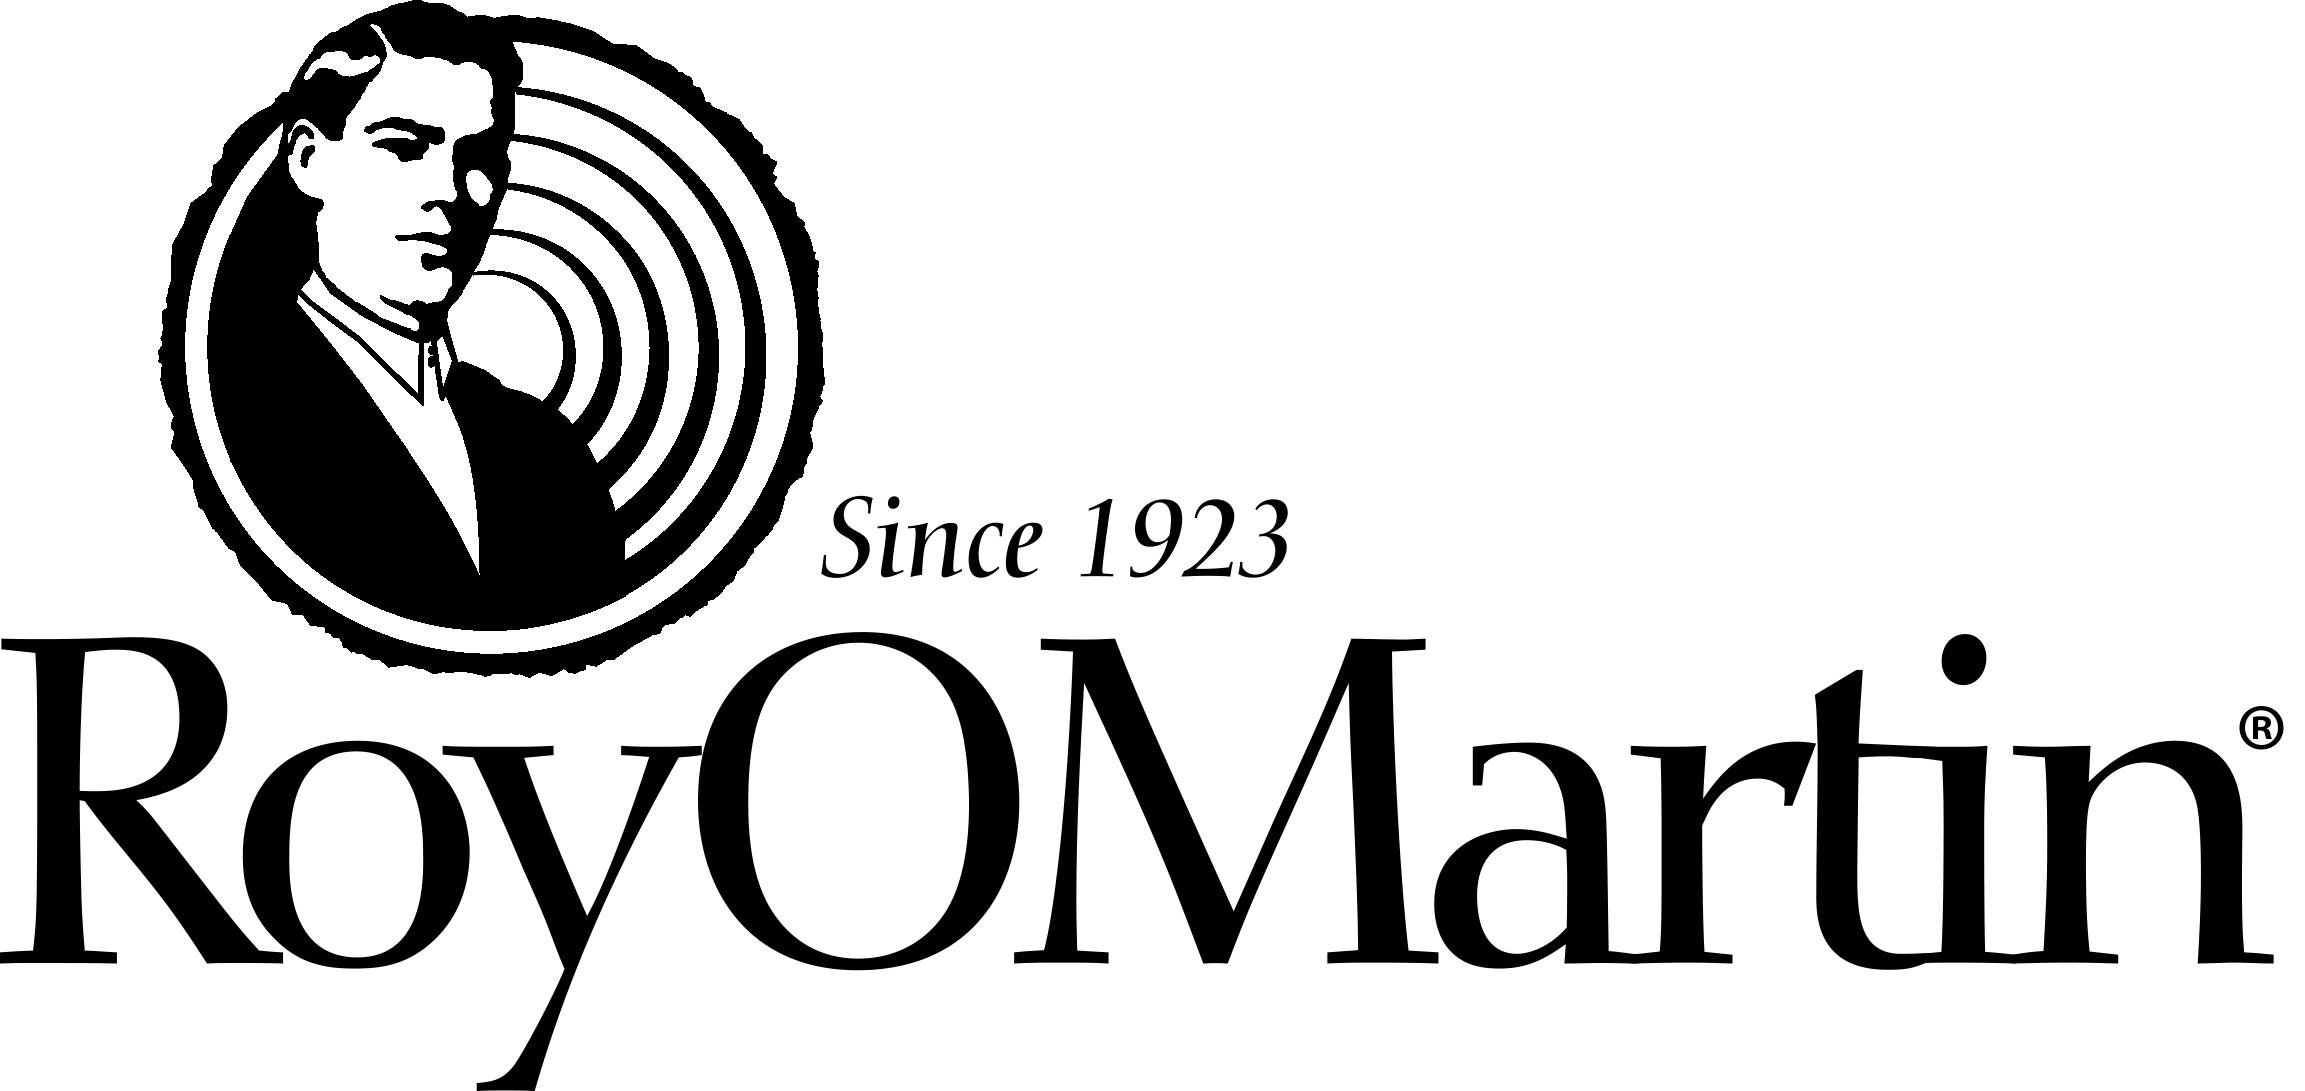 ROM_Master_logo_TM-BW.jpg